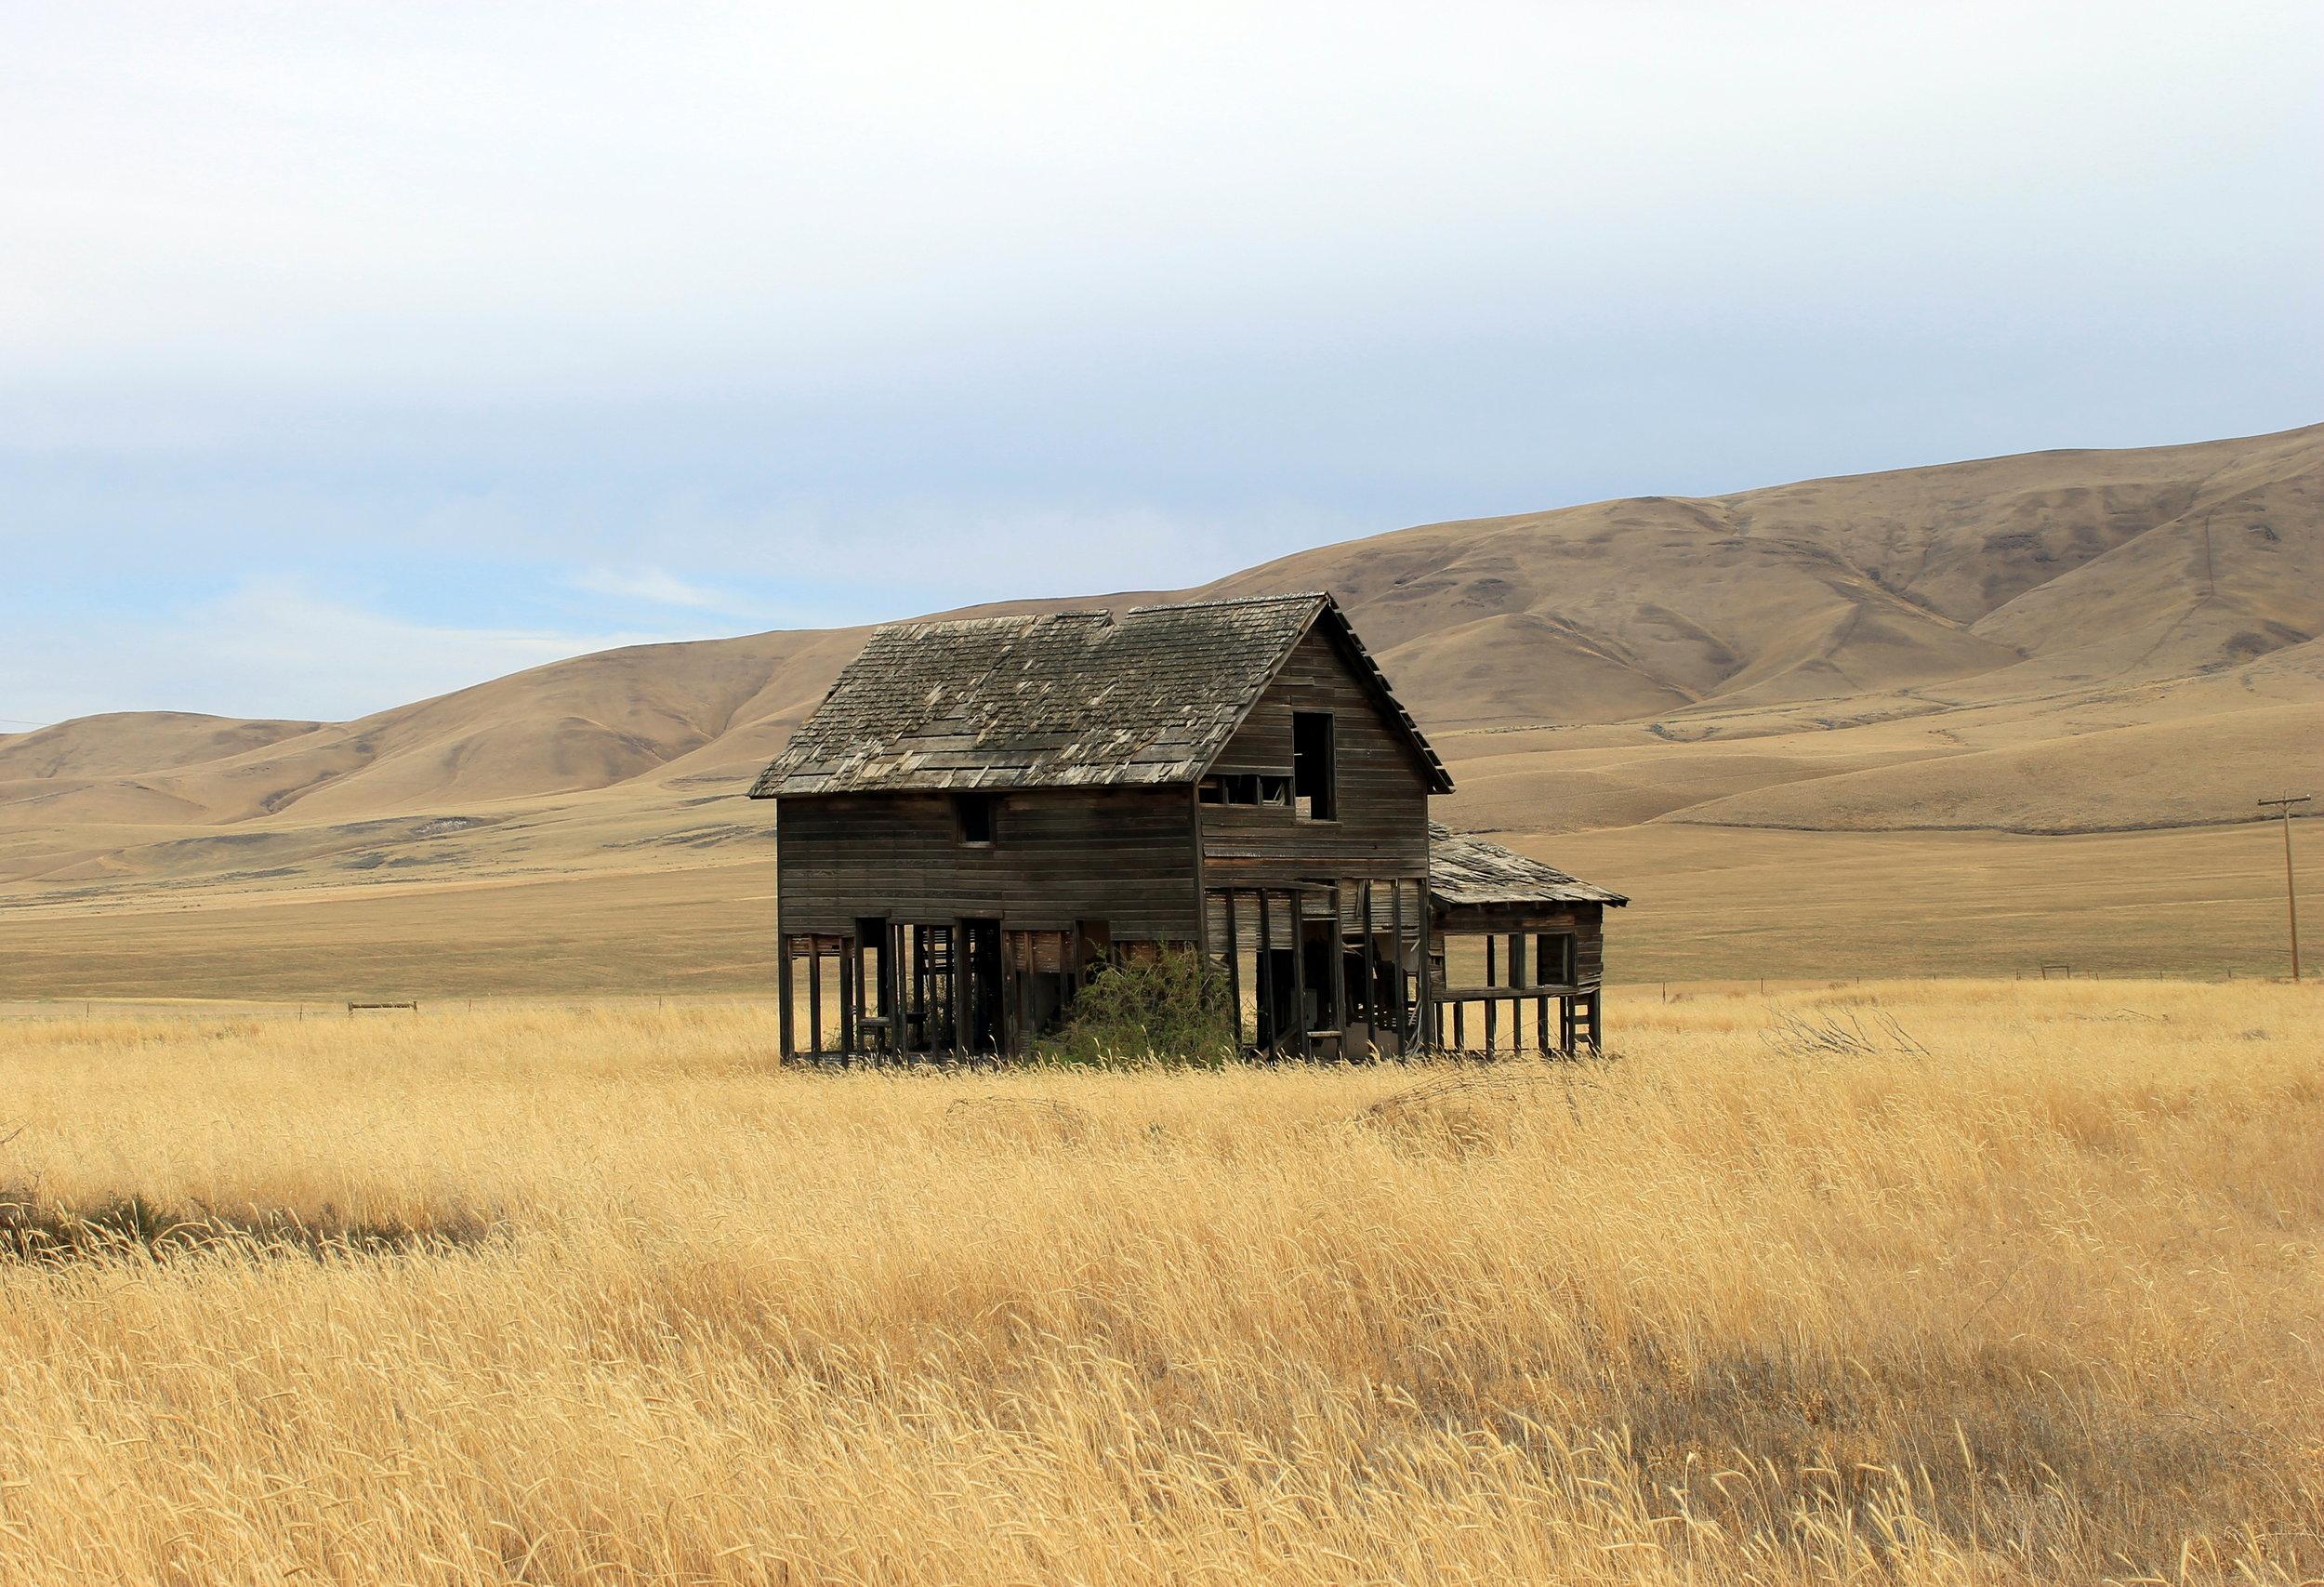 2014-07-27 abandoned farm house east of Moxee.jpg